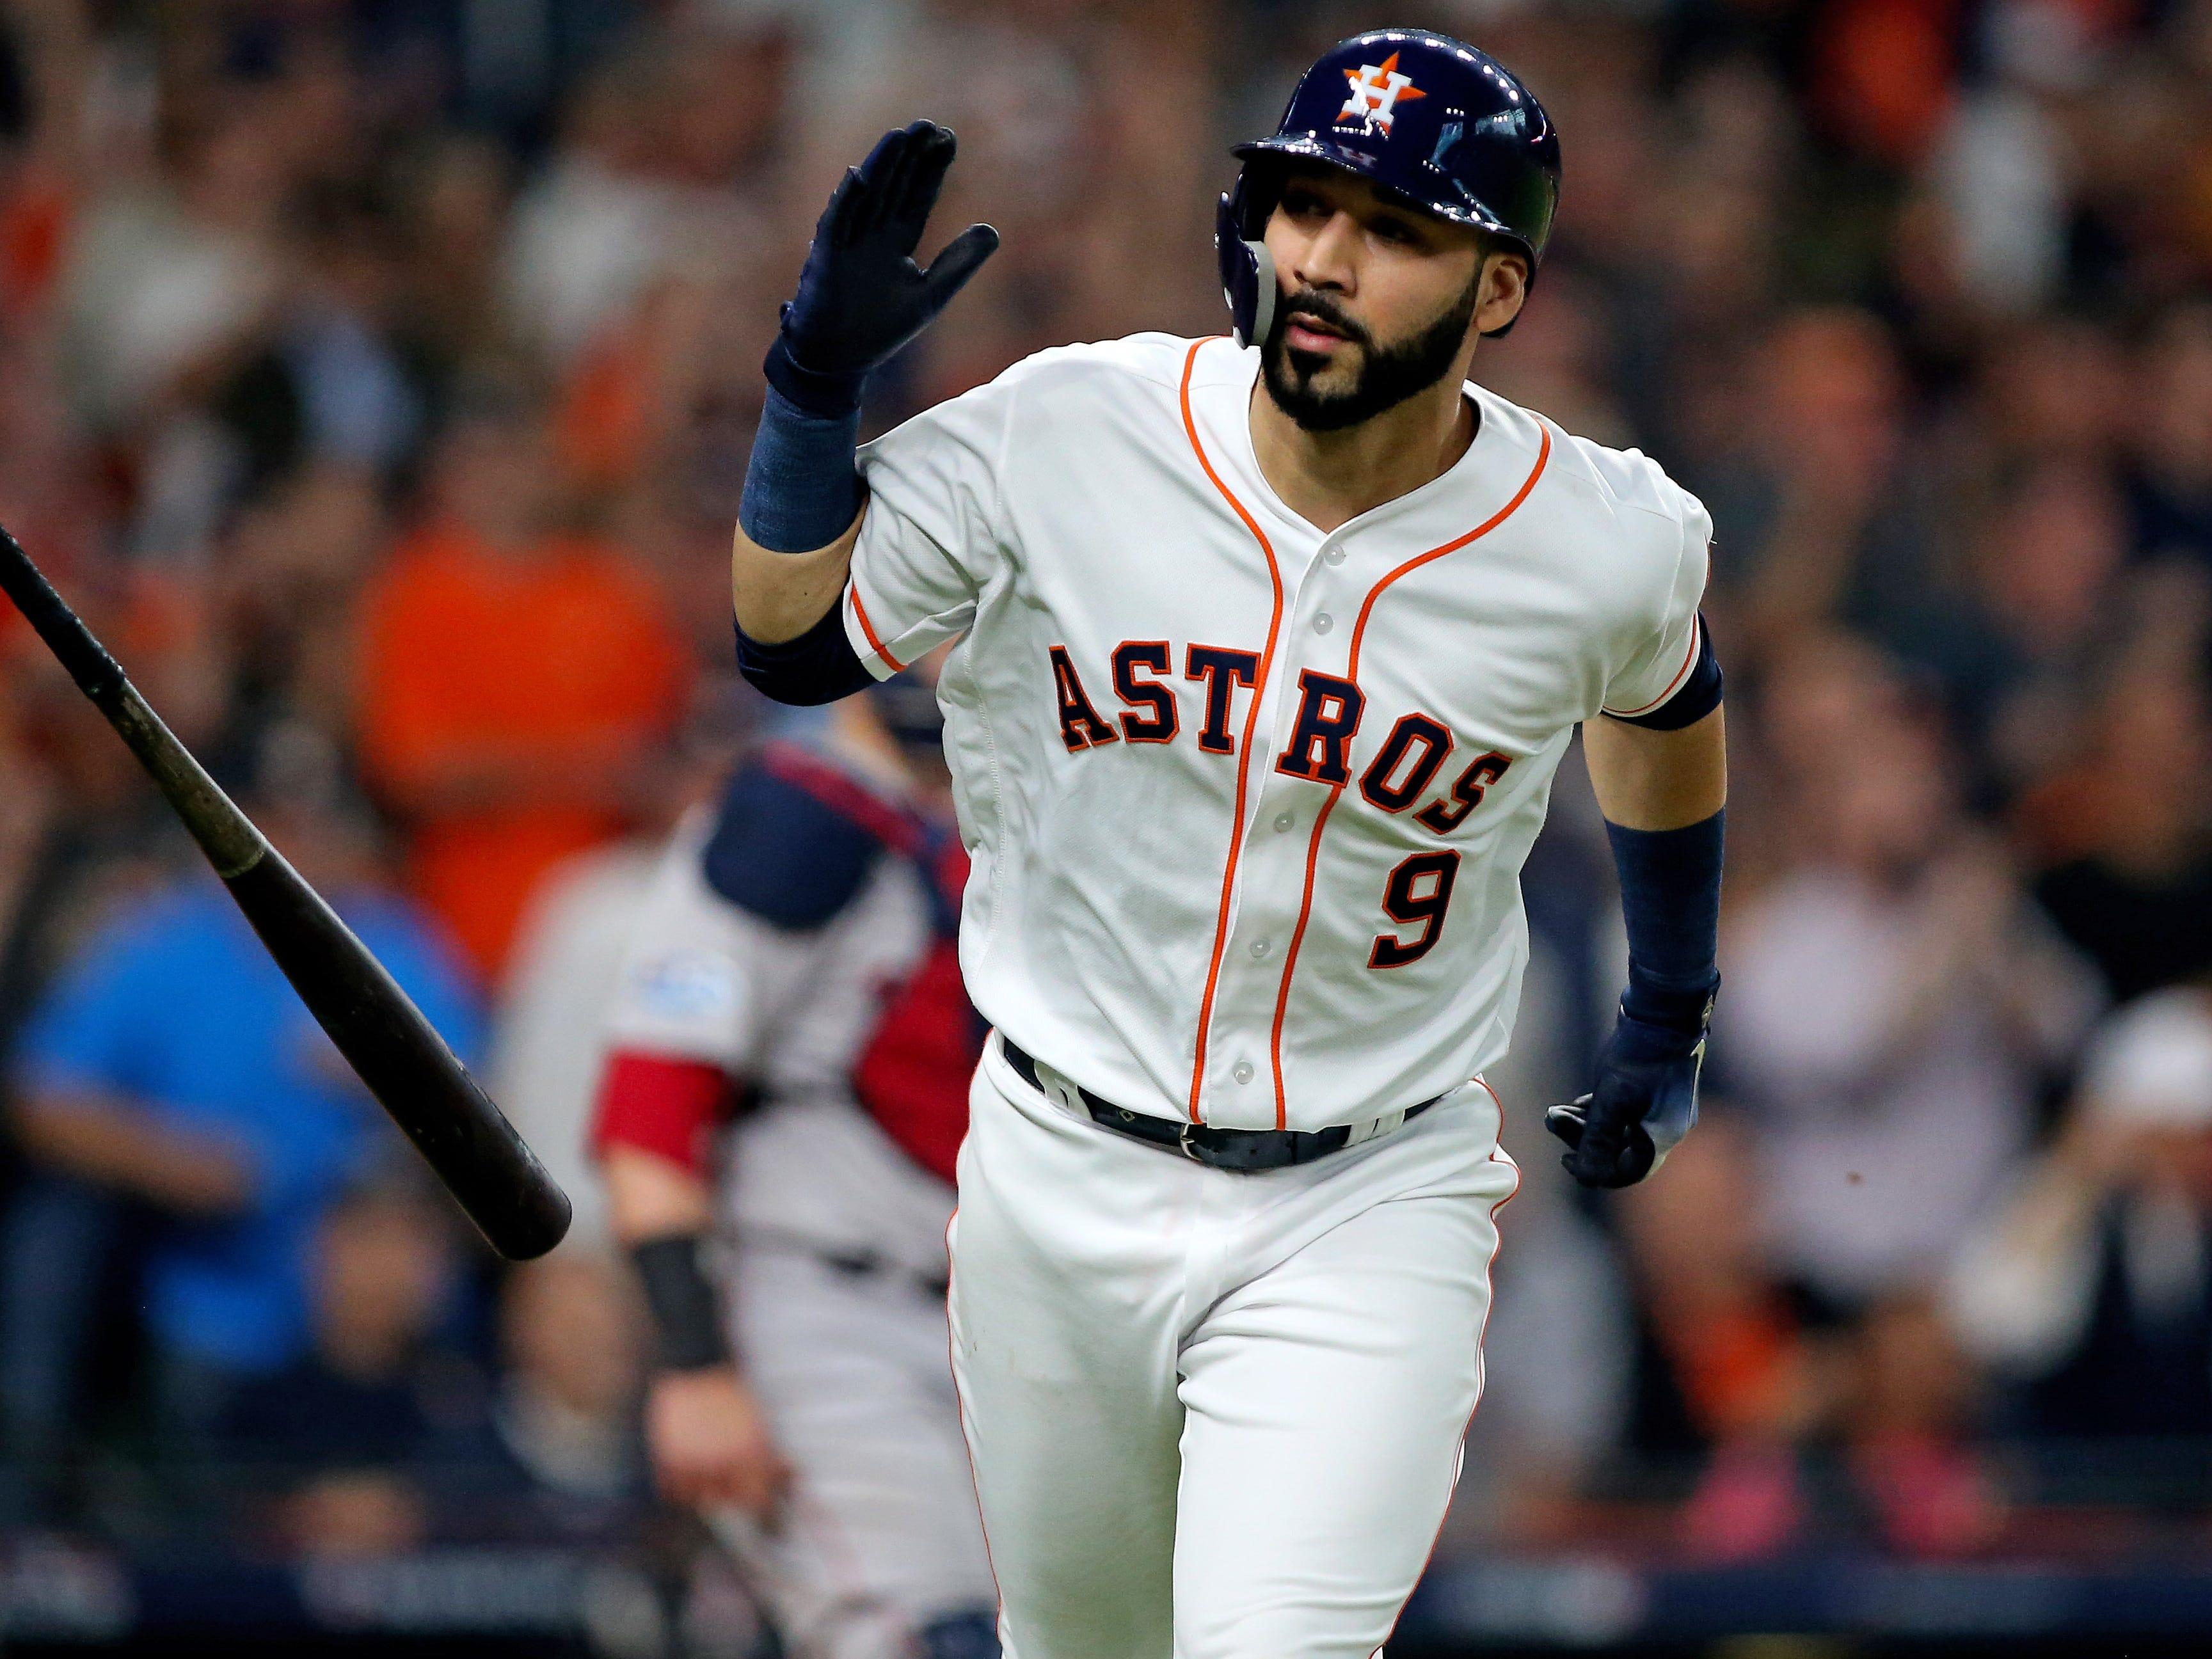 Marwin Gonzalez (30, INF/OF, Astros)